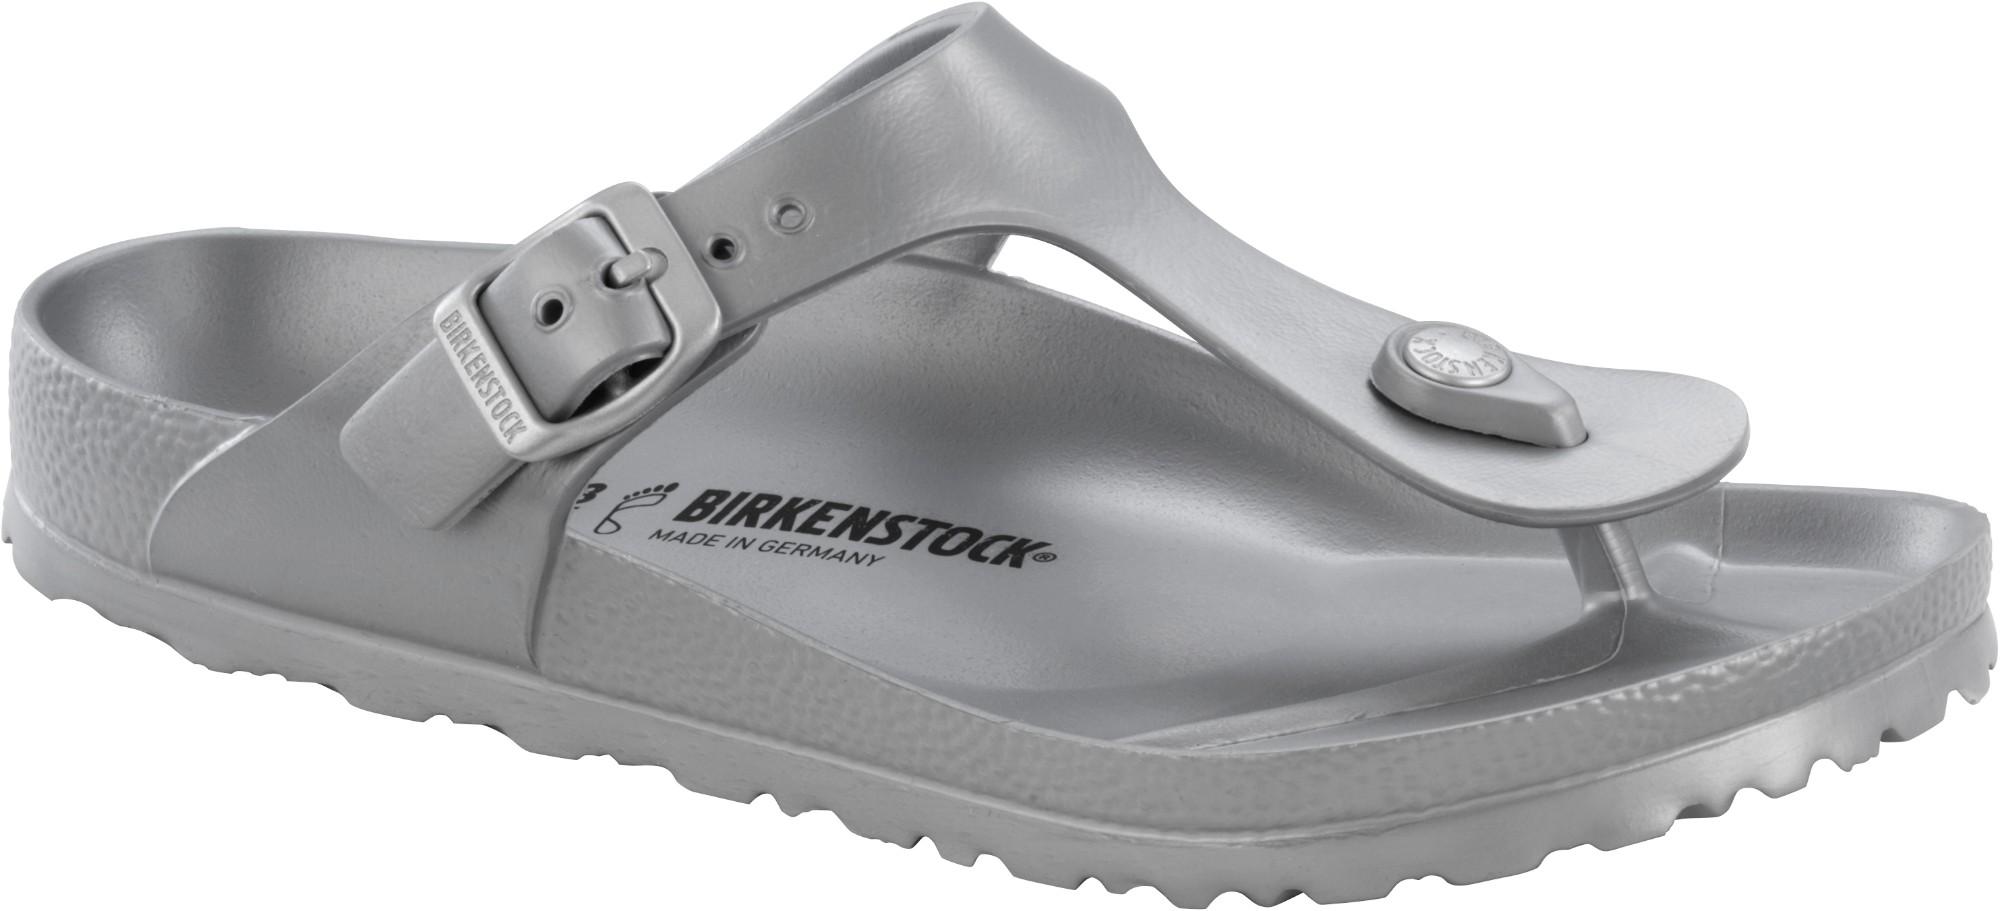 Birkenstock Gizeh EVA Metallic Silver 39